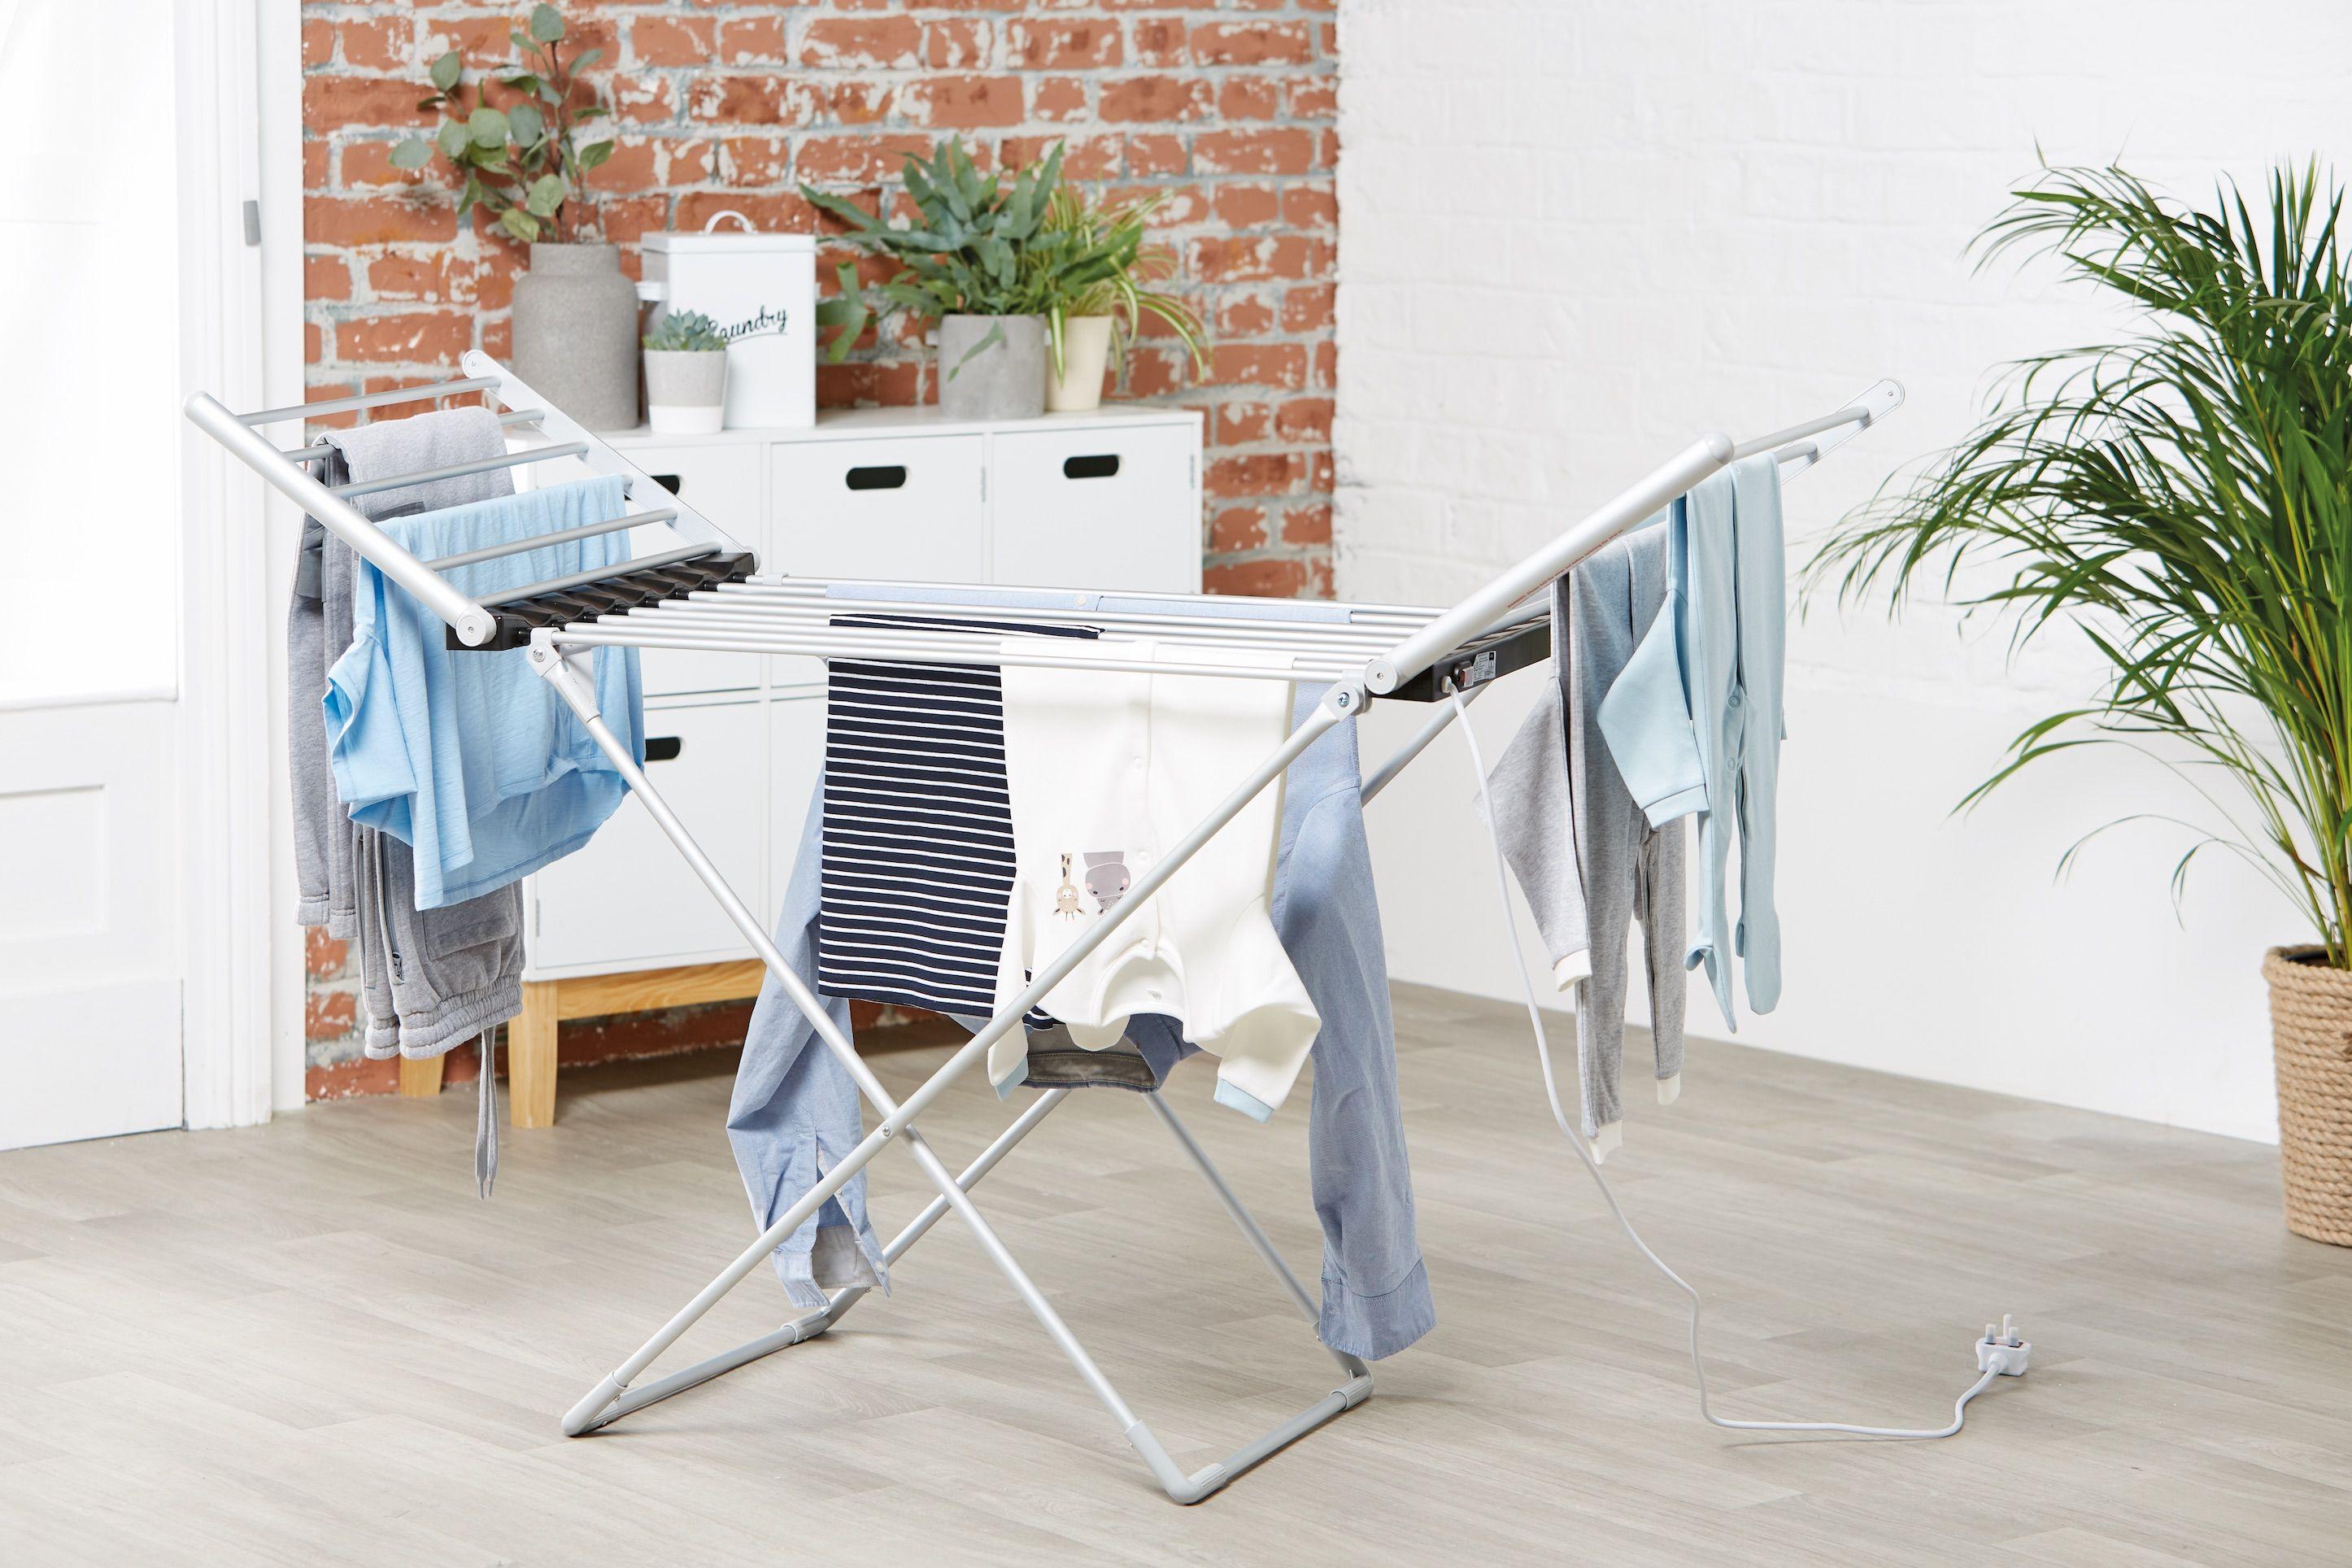 Aldi is selling a fan heater for £10 to